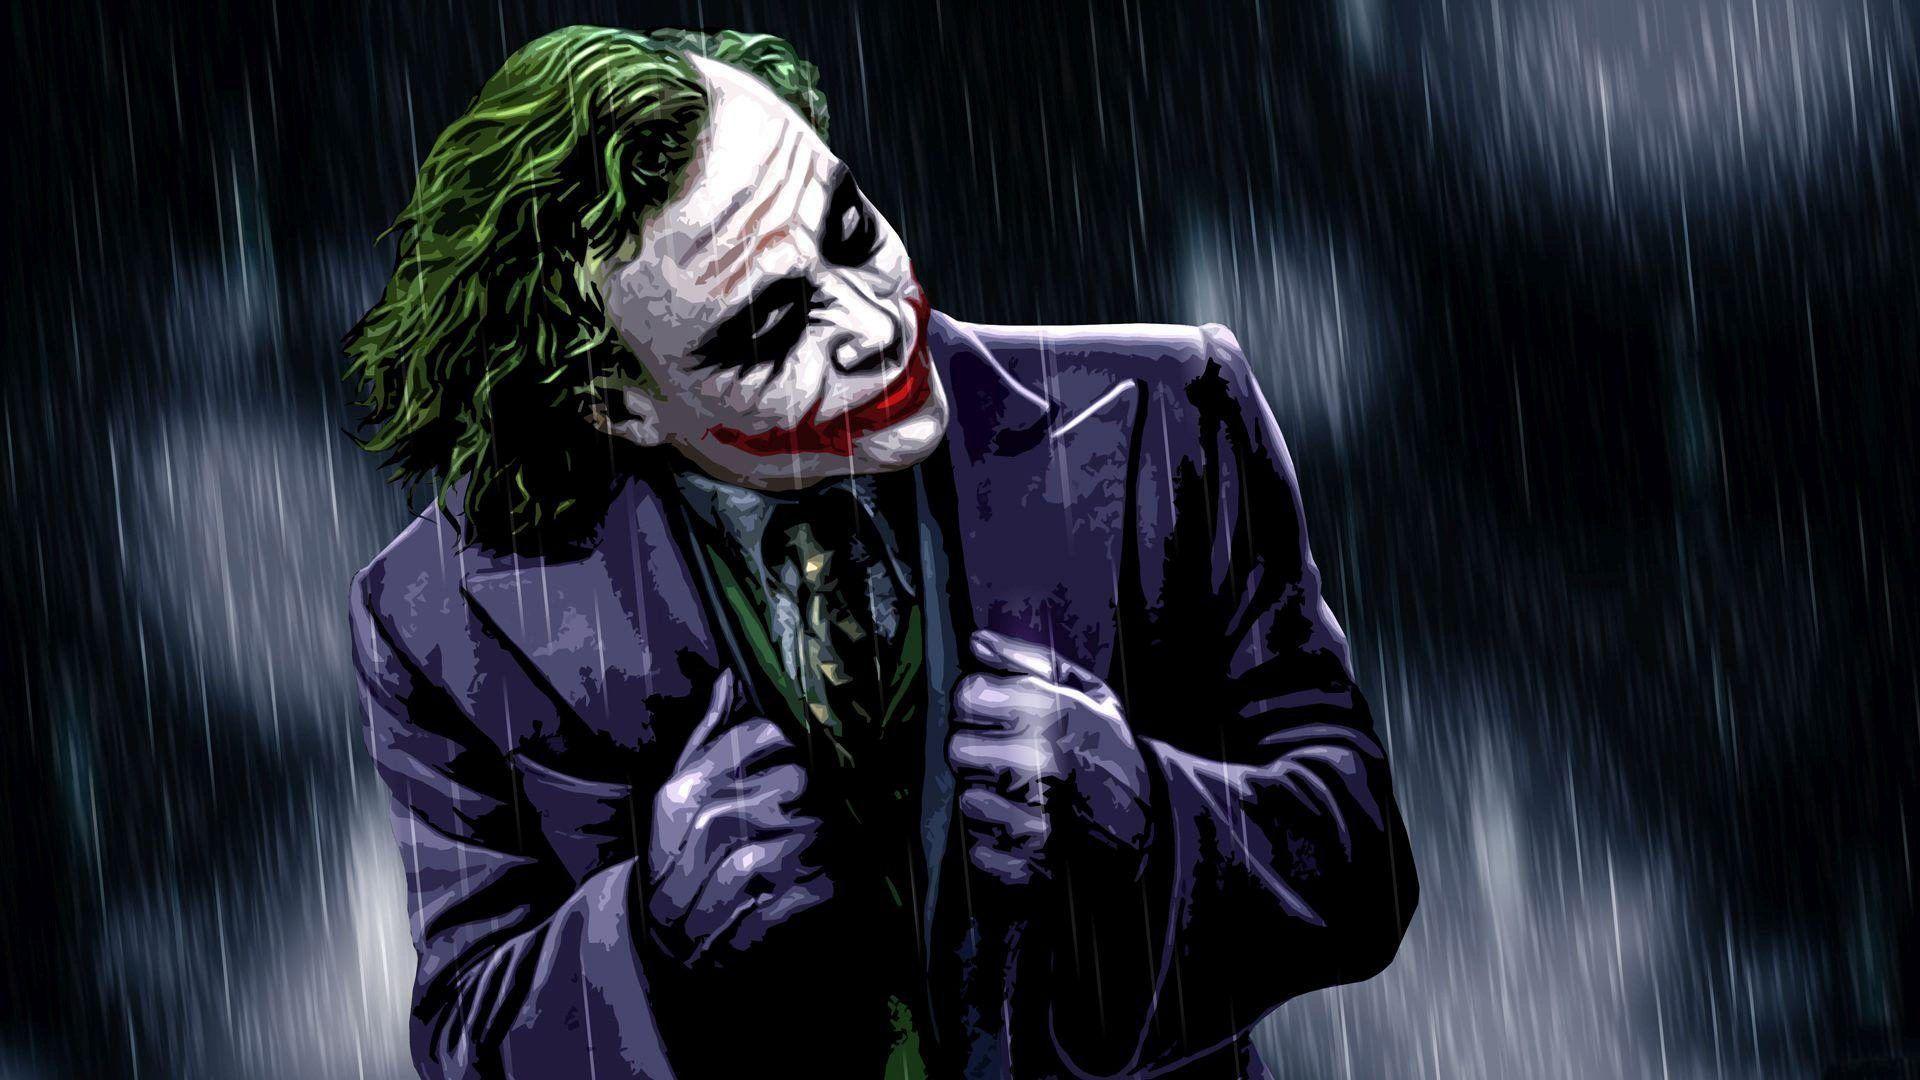 Batman Joker 4k Ultra Hd Wallpaper Joker Images Hd 1080p Download Free